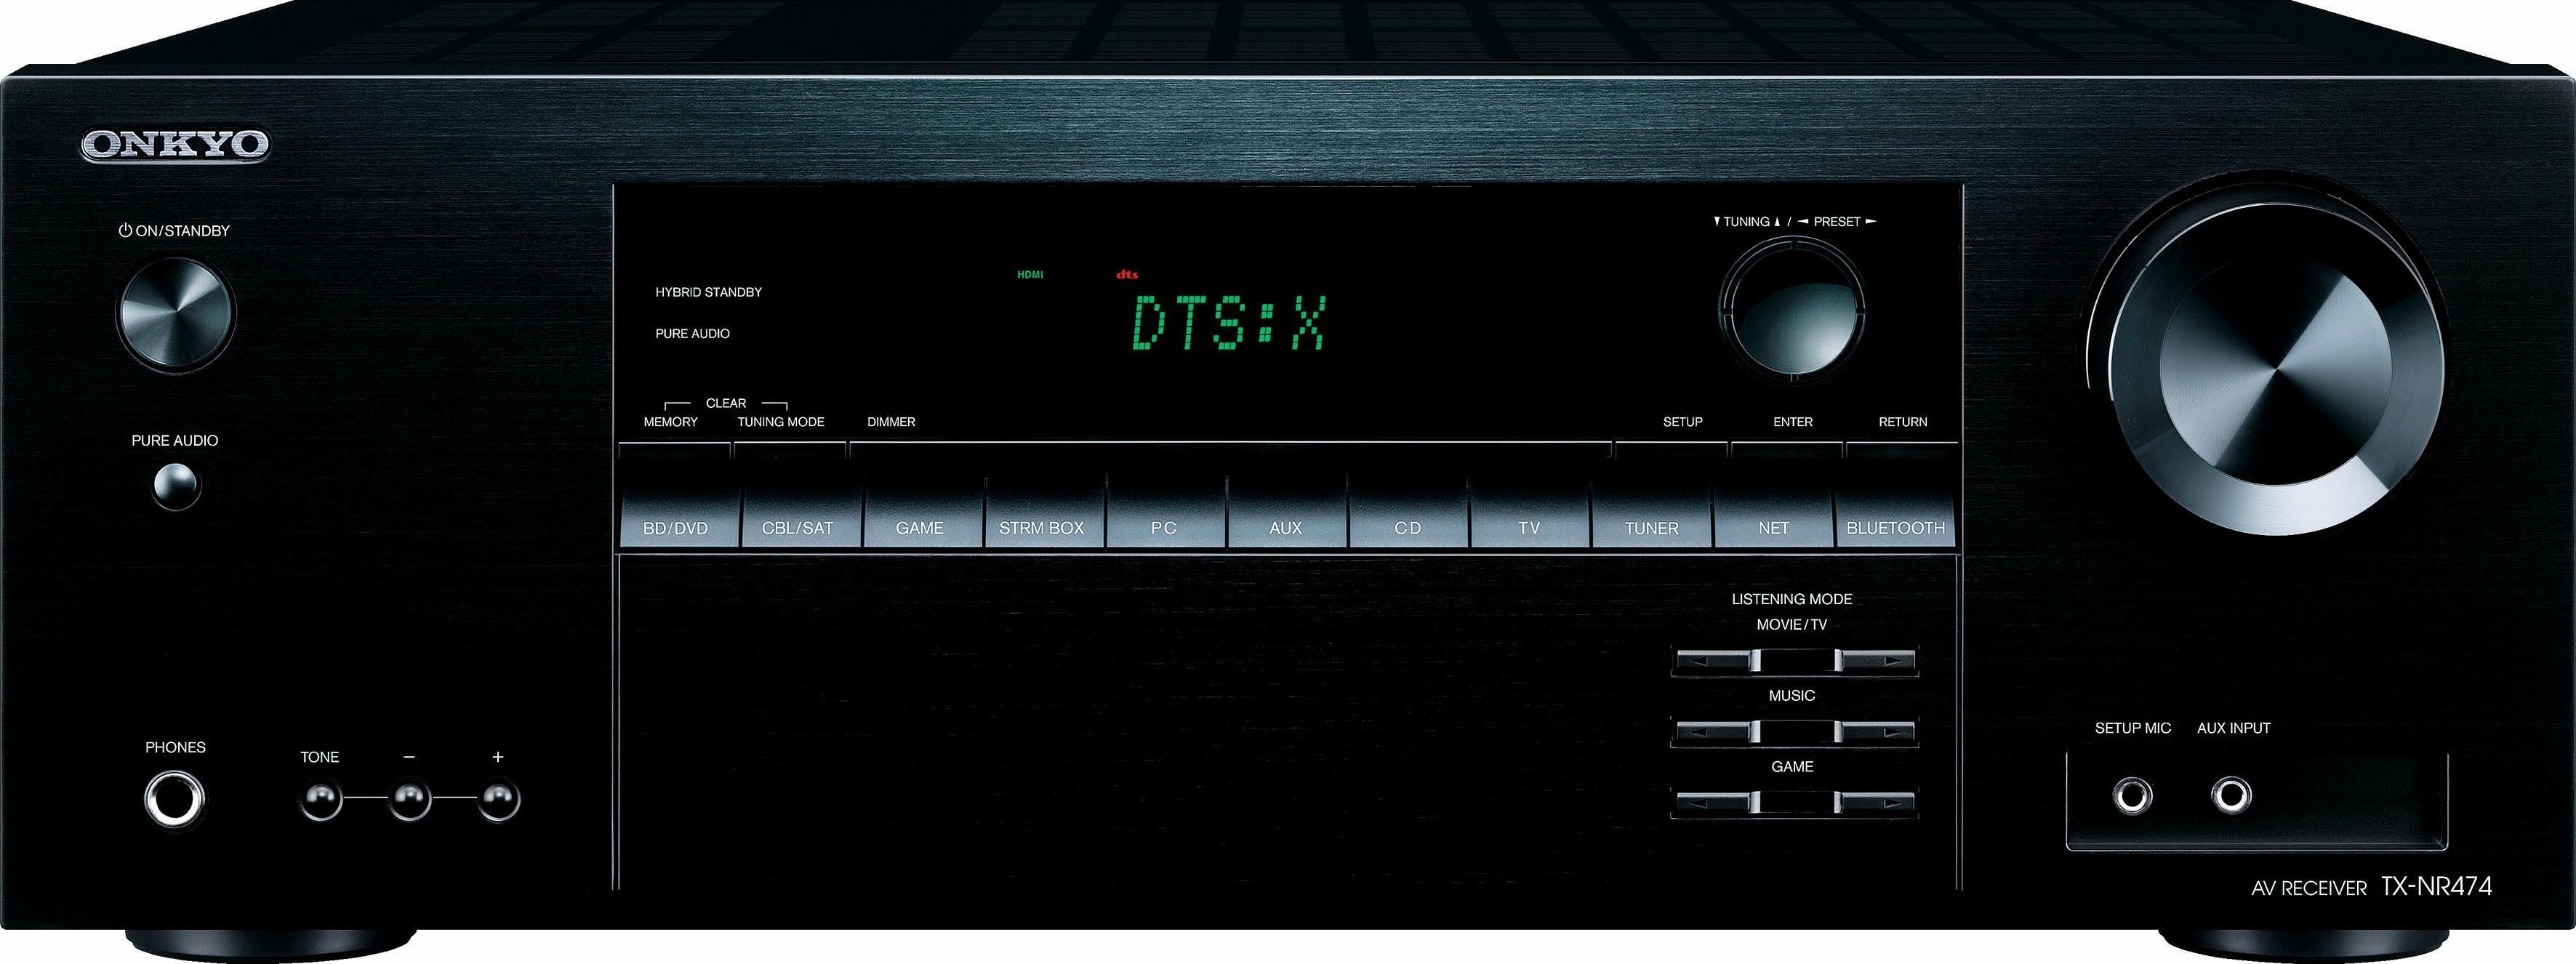 Onkyo »TX-NR474« 5 AV-Receiver (LAN (Ethernet), WLAN, Bluetooth, 3D-fähig, Hi-Res Audio, Klangregelung: Bass, Höhenregler)